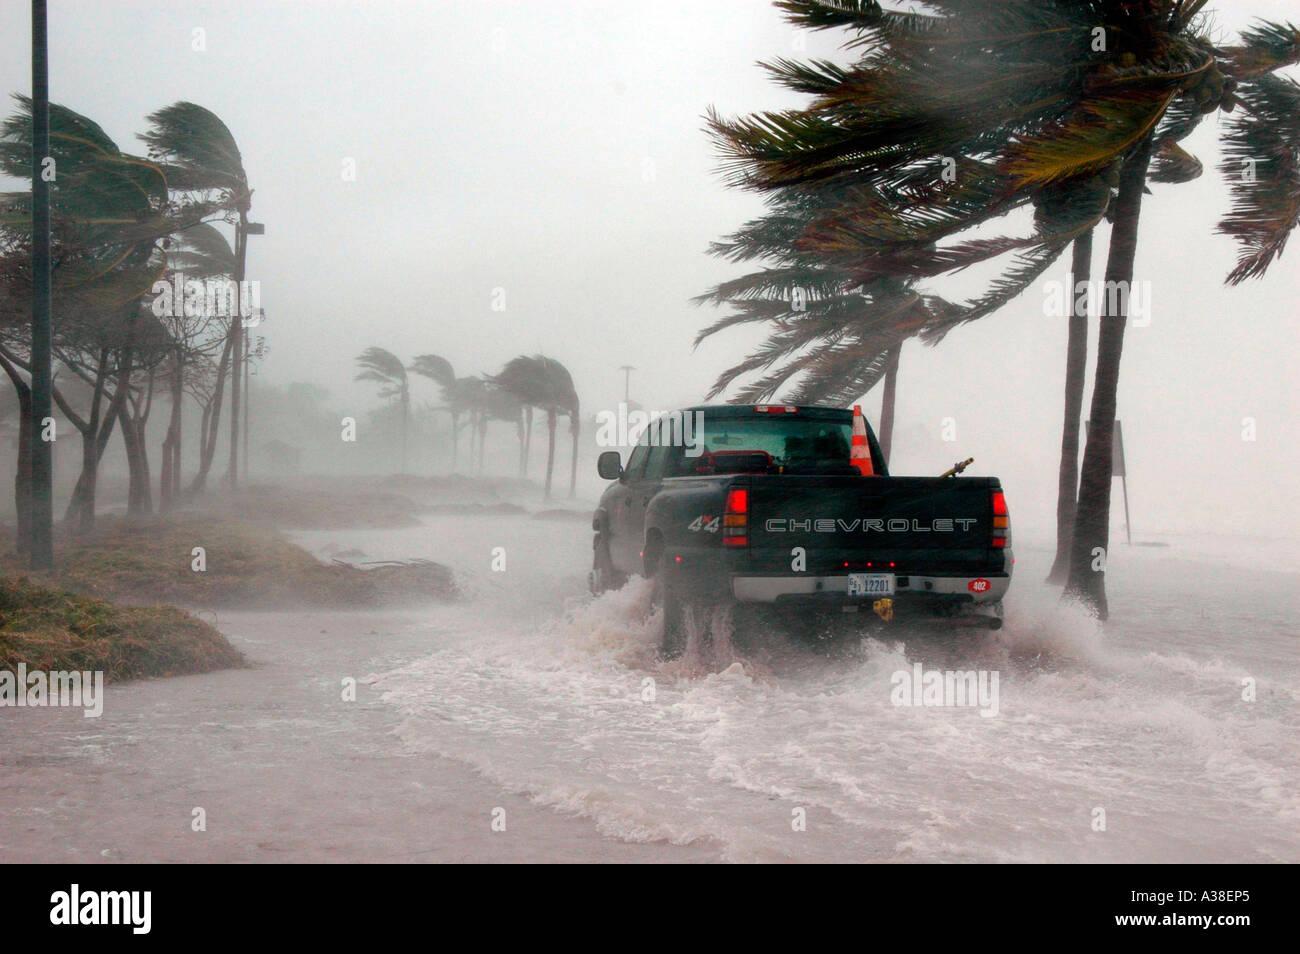 Pickup-Truck Straßenfahrt während Hurrikan Stockbild